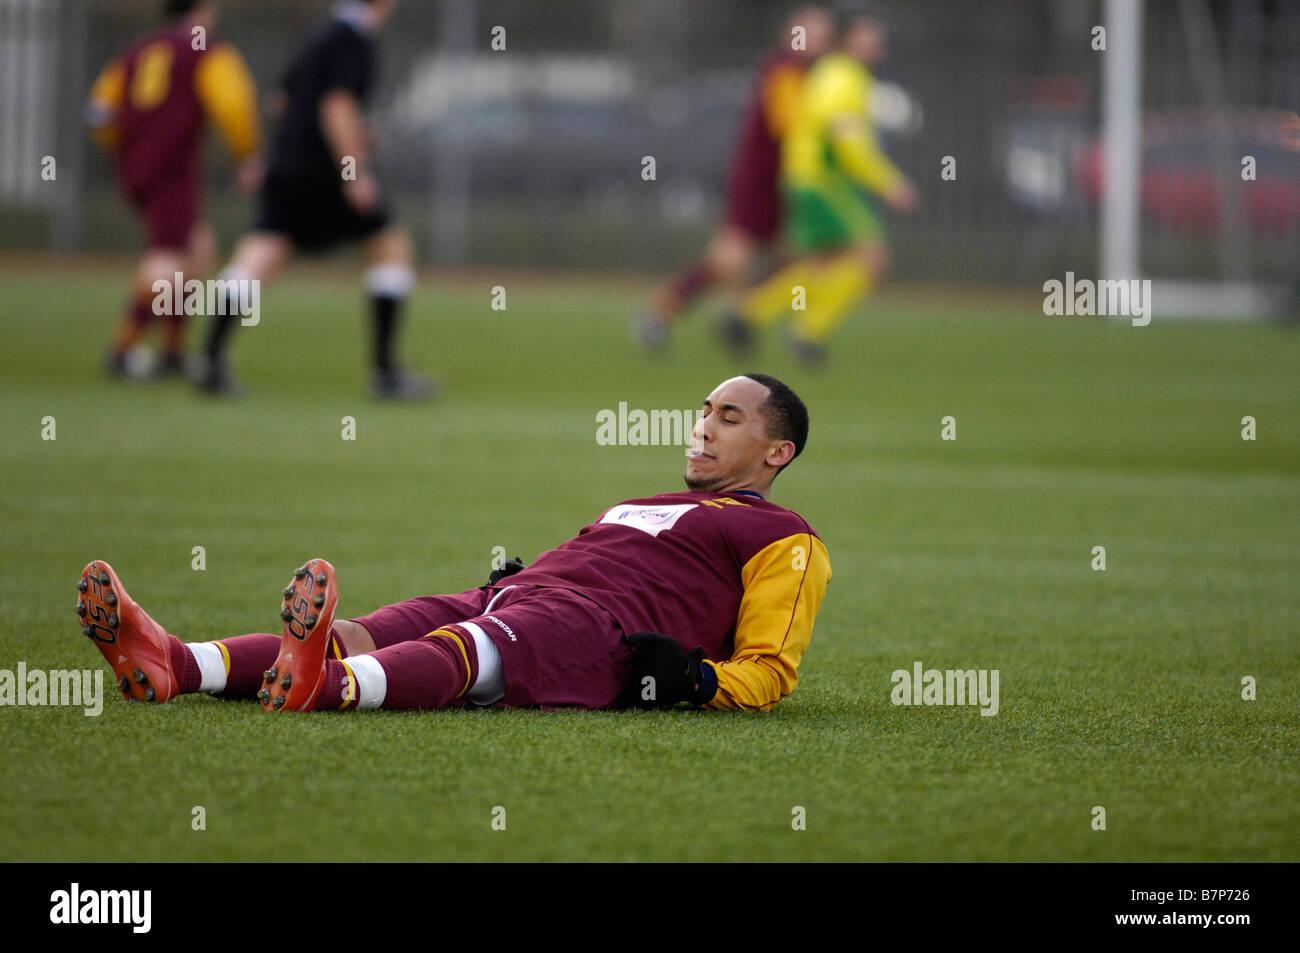 footballer suffering from cramp - Stock Image